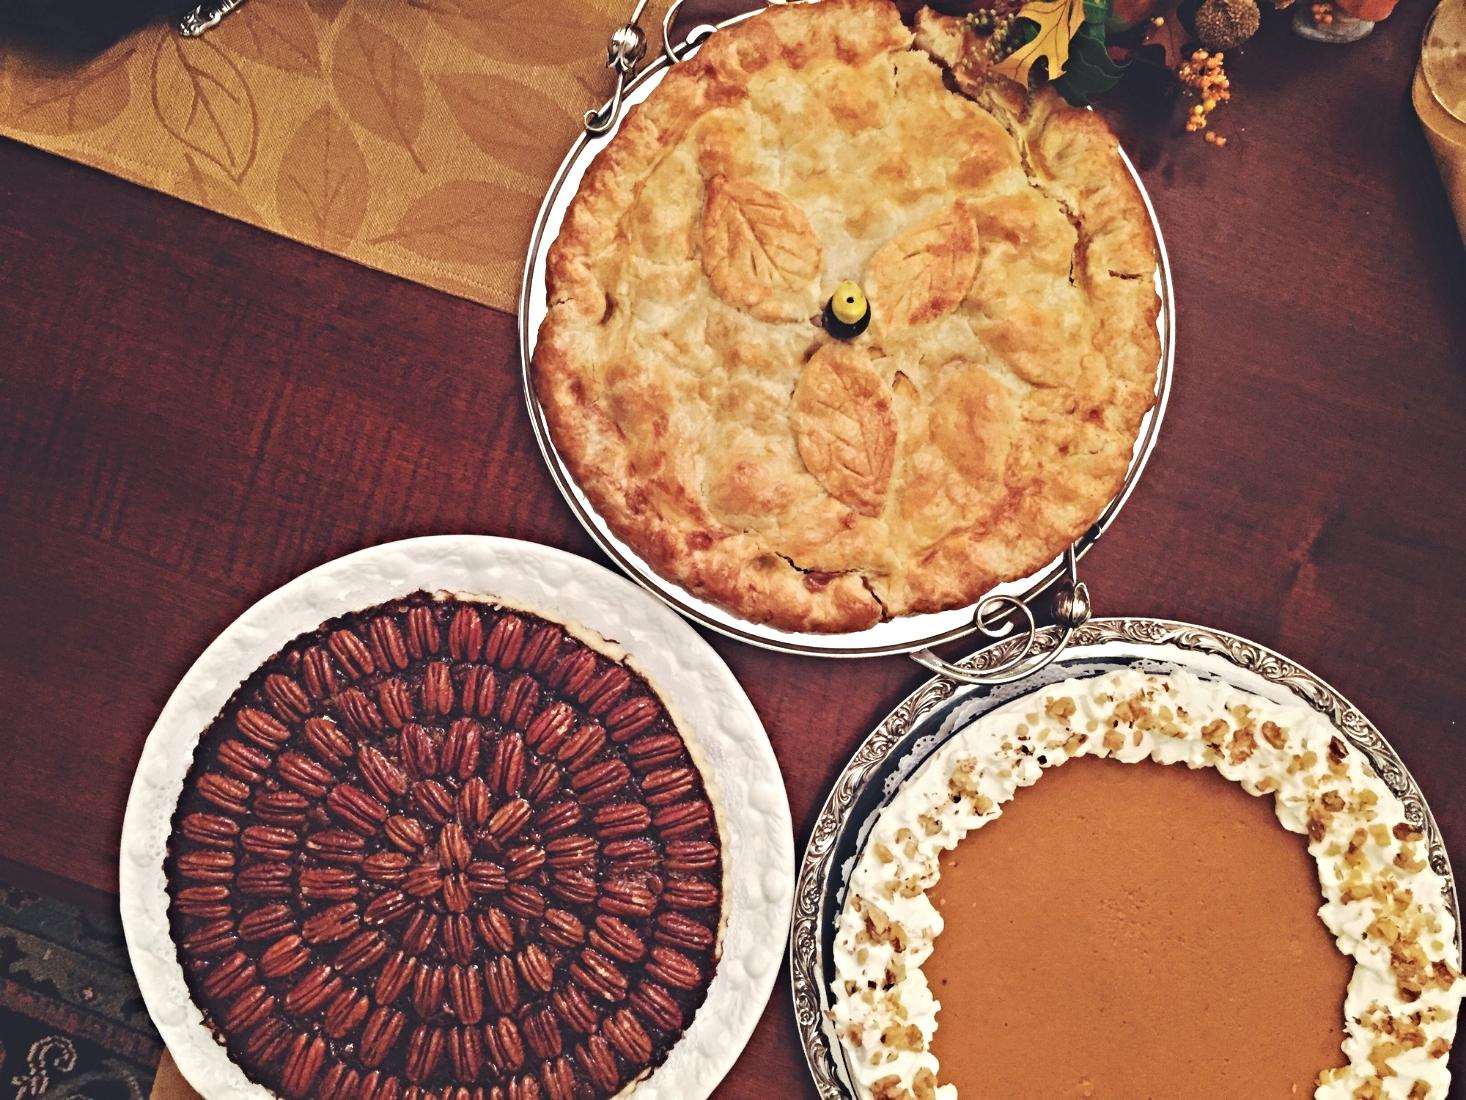 Burbon chocolate pecan, salted caramel apple, and sweet potato and pumpkin ginger pie